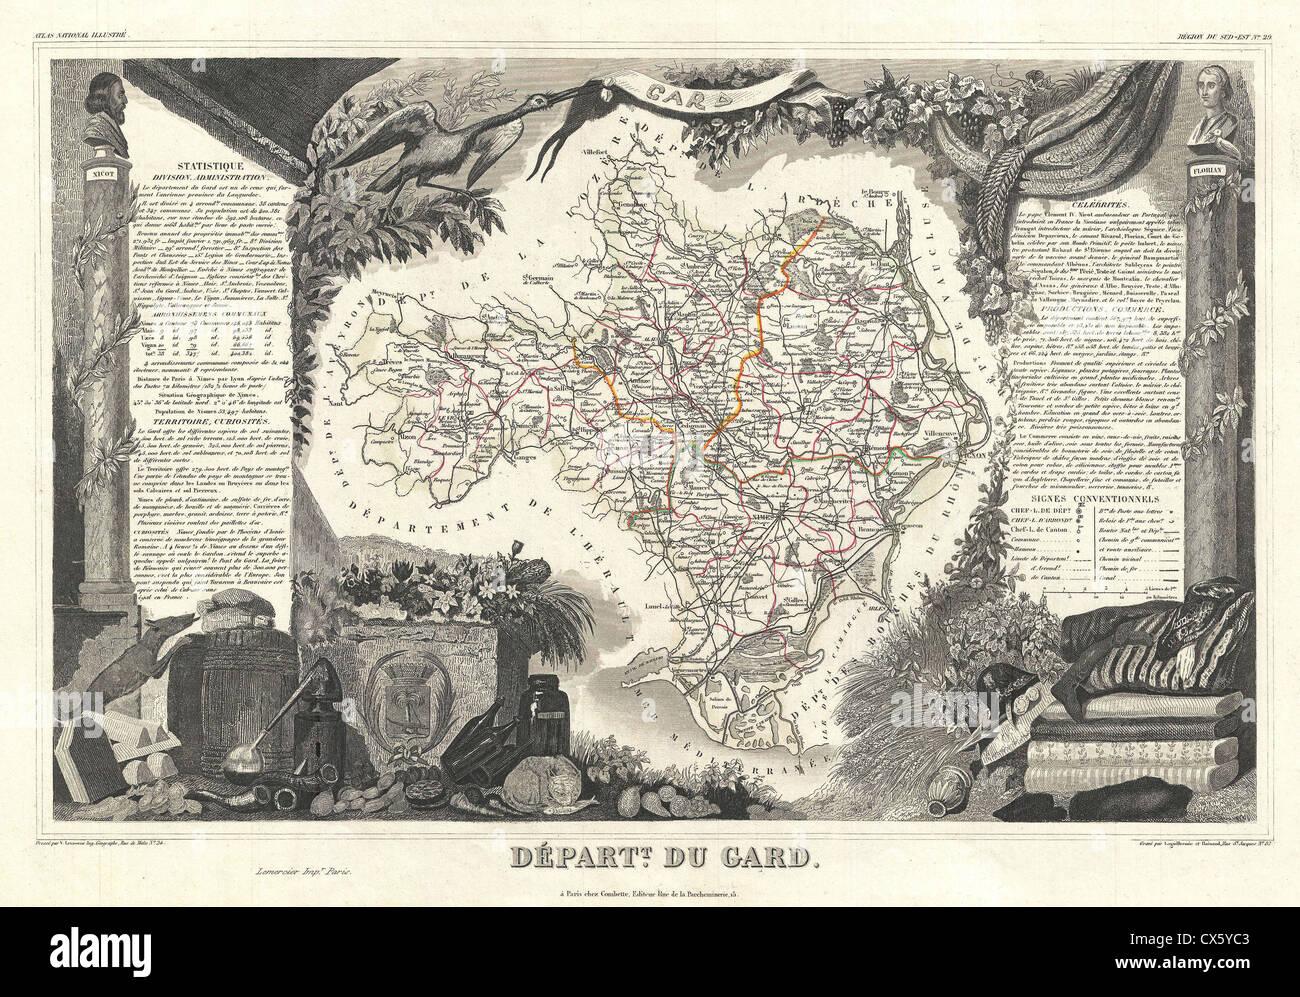 1852 Levasseur Map of the Department du Gard, France - Stock Image